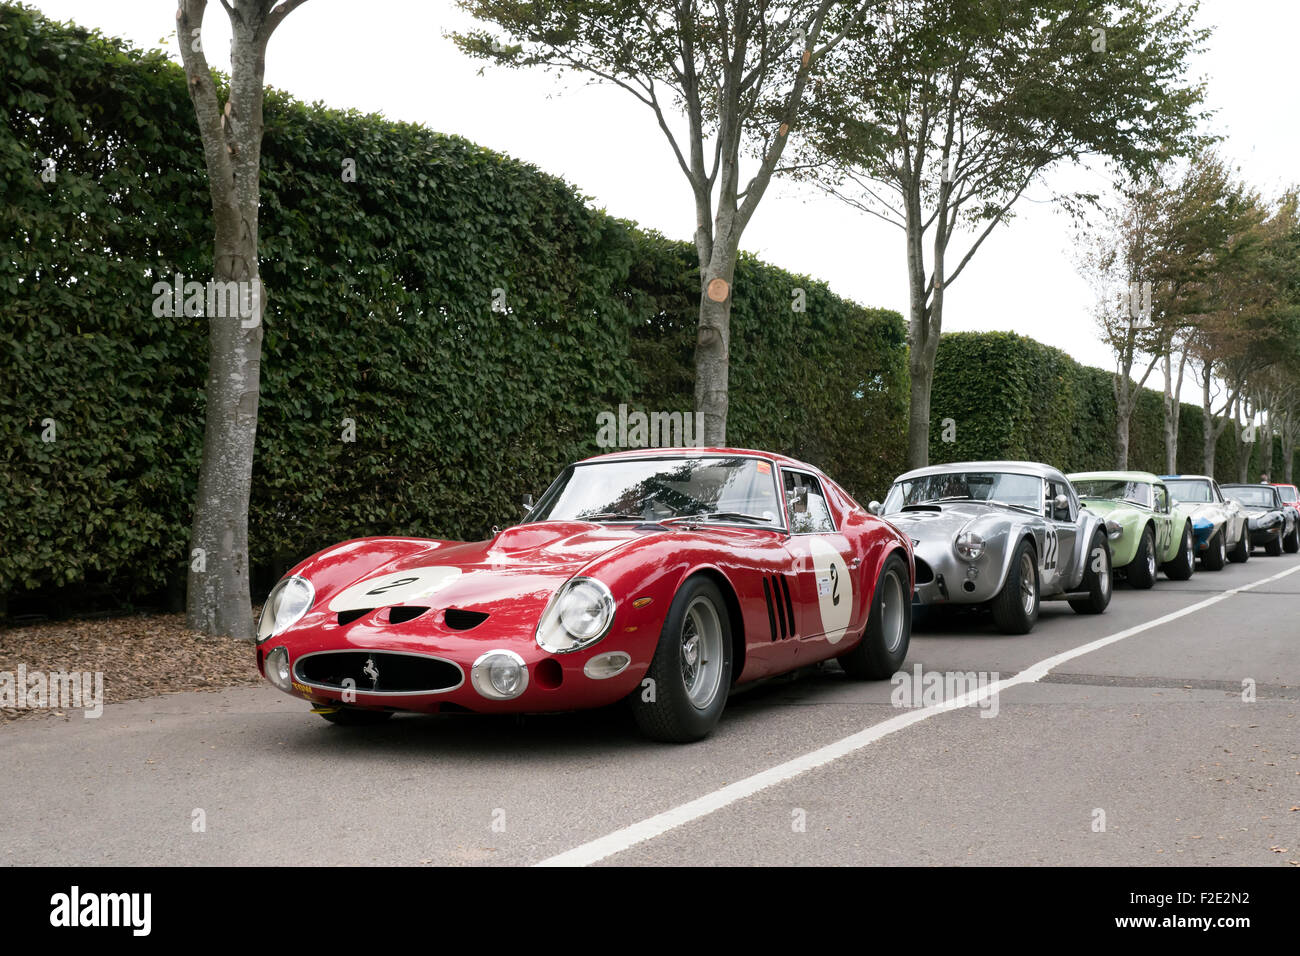 Klassische Ferrari Sportwagen-Rennen beim guten Holz-Revival treffen West Sussex UK Stockbild